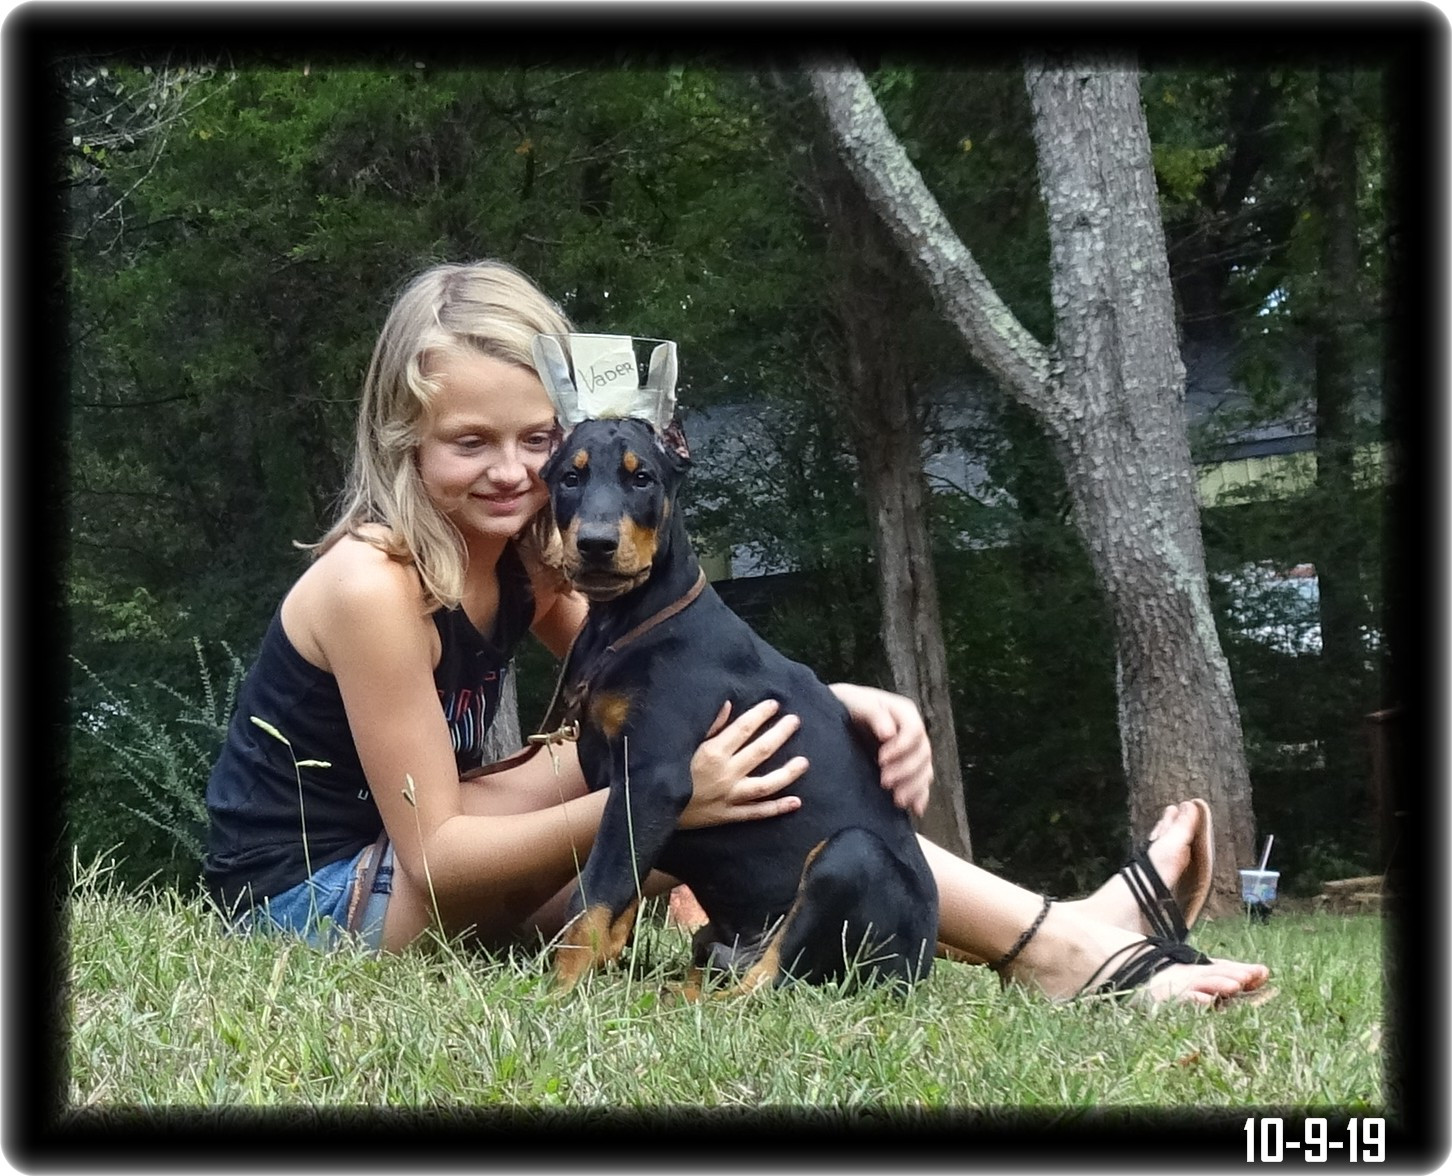 Vader - Greta & Caspian pup born 7-21-19 ...Super Pup 2 now home in  Mooresville FL - Established client